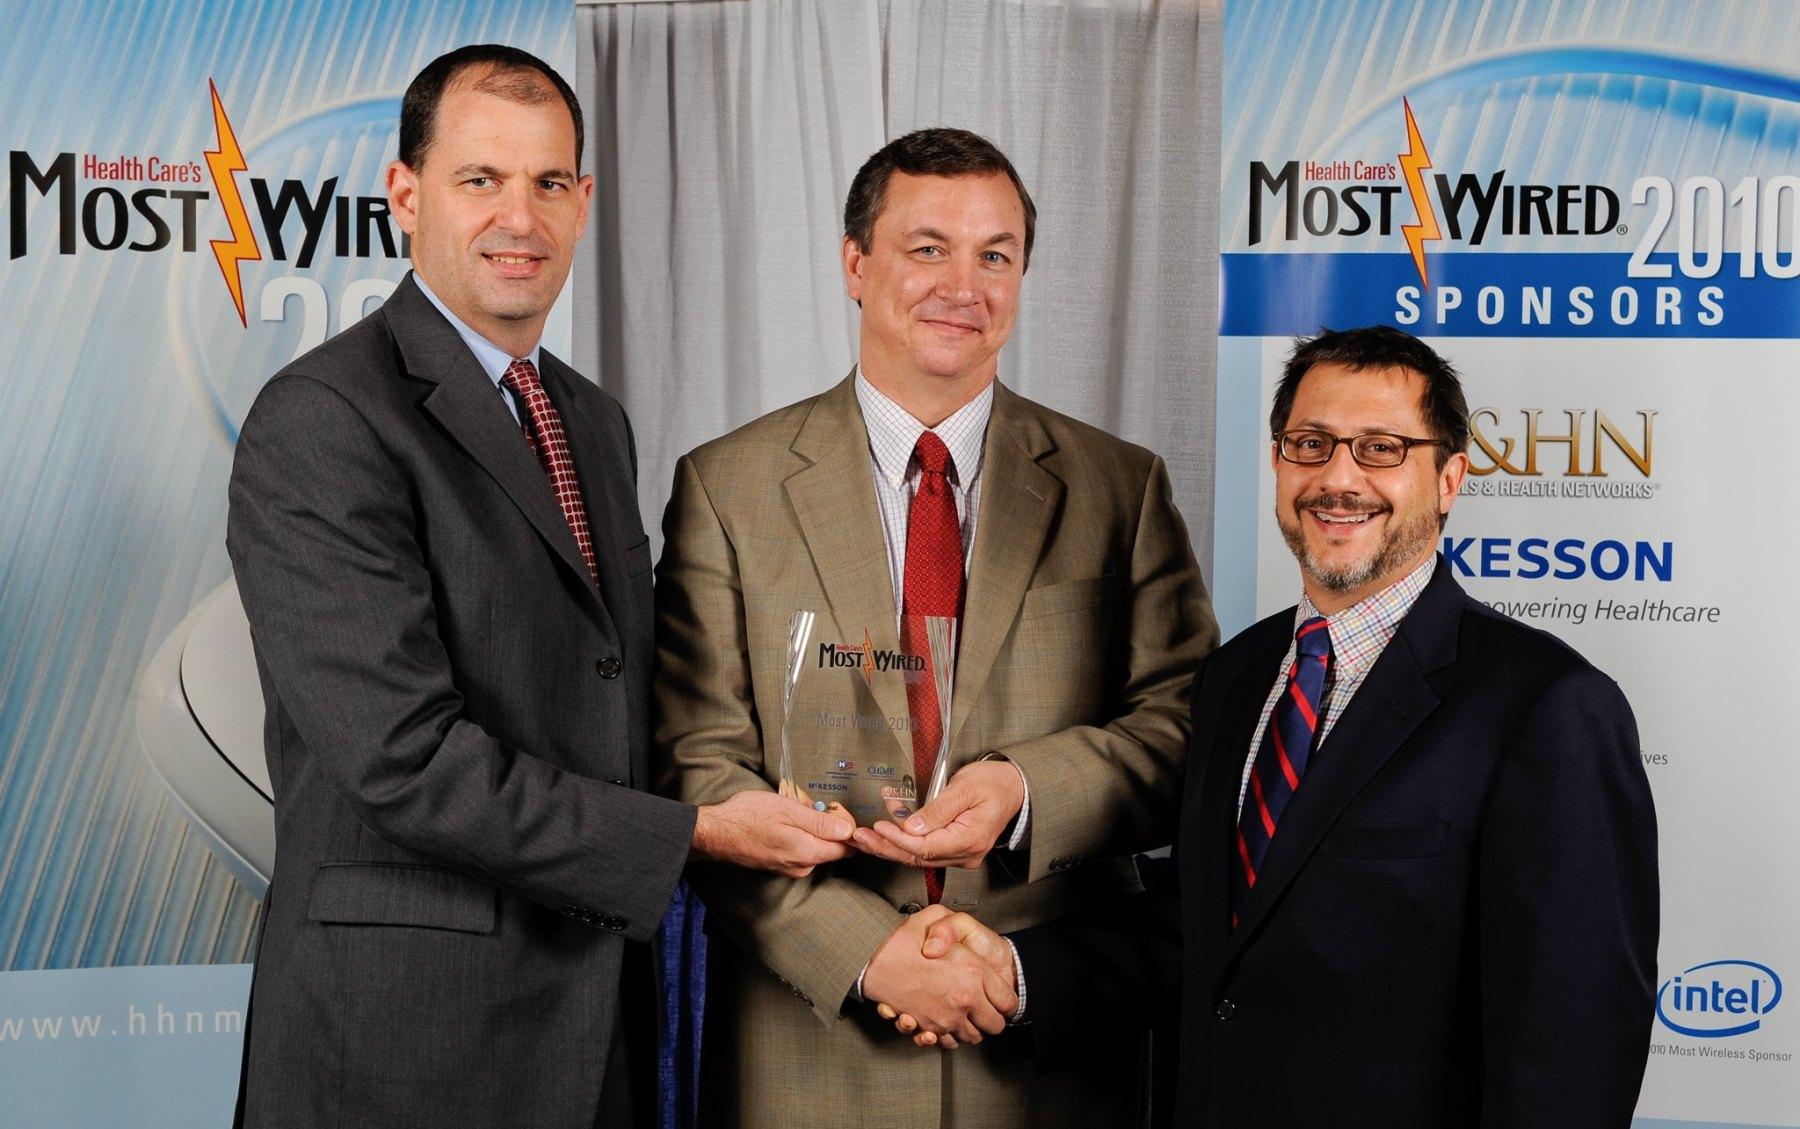 Awards presentation by conference sponsors